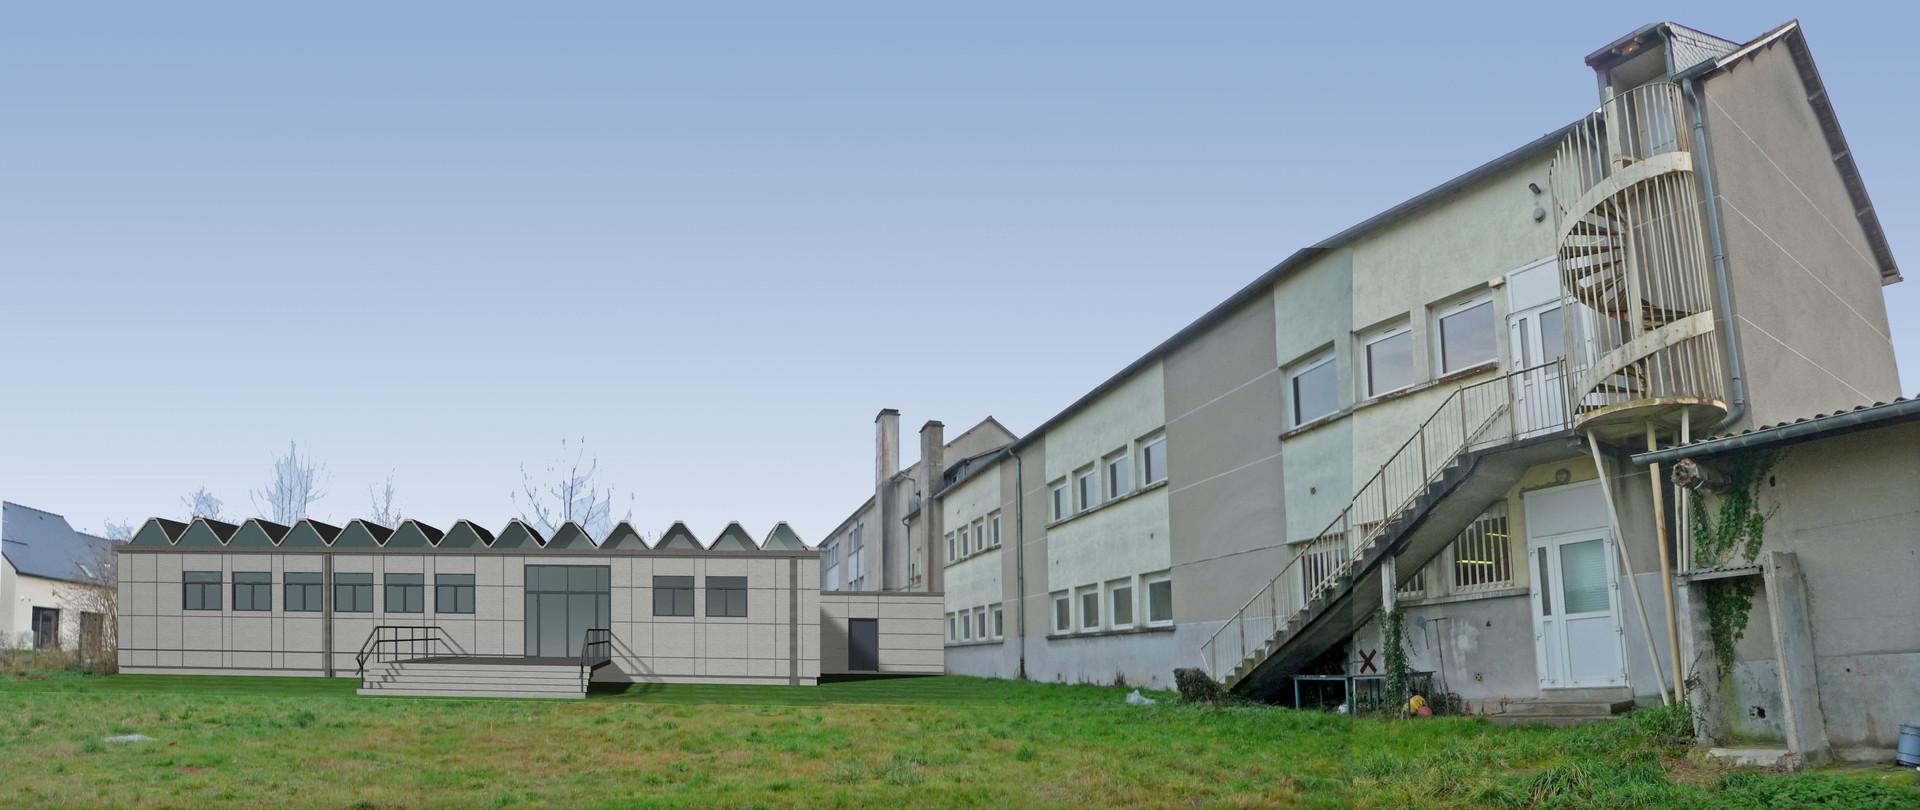 PAUL BOUET ARCHITECTE - COLLEGE LA PROVIDENCE - MONTAUBAN DE BRETAGNE